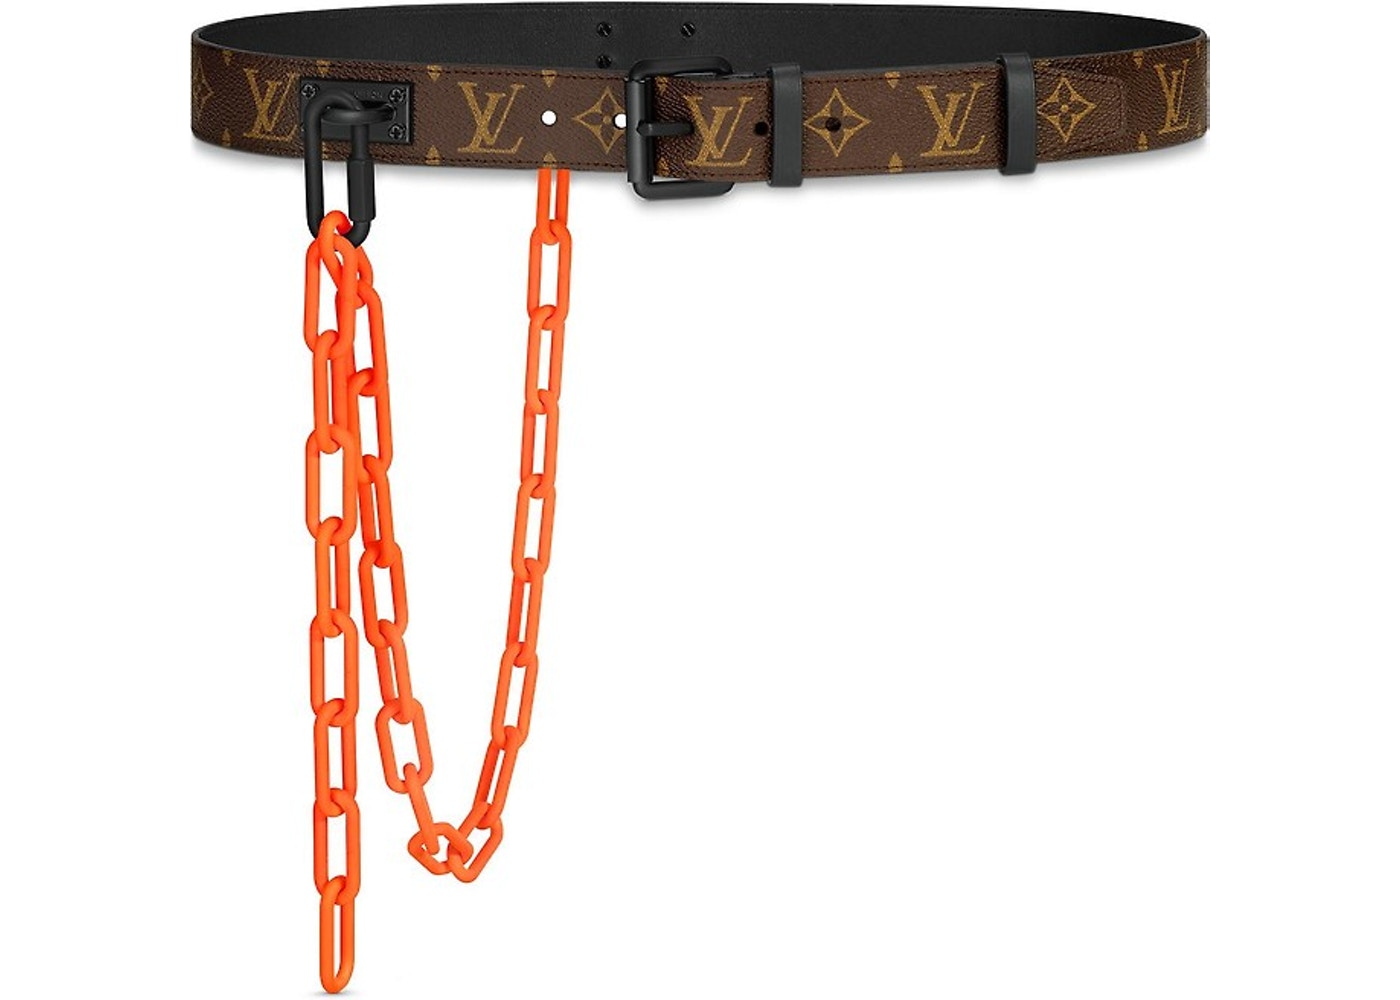 a49facf35db7 Louis Vuitton Signature Belt Monogram Chains 35MM Brown Orange. Monogram  Chains 35MM Brown Orange